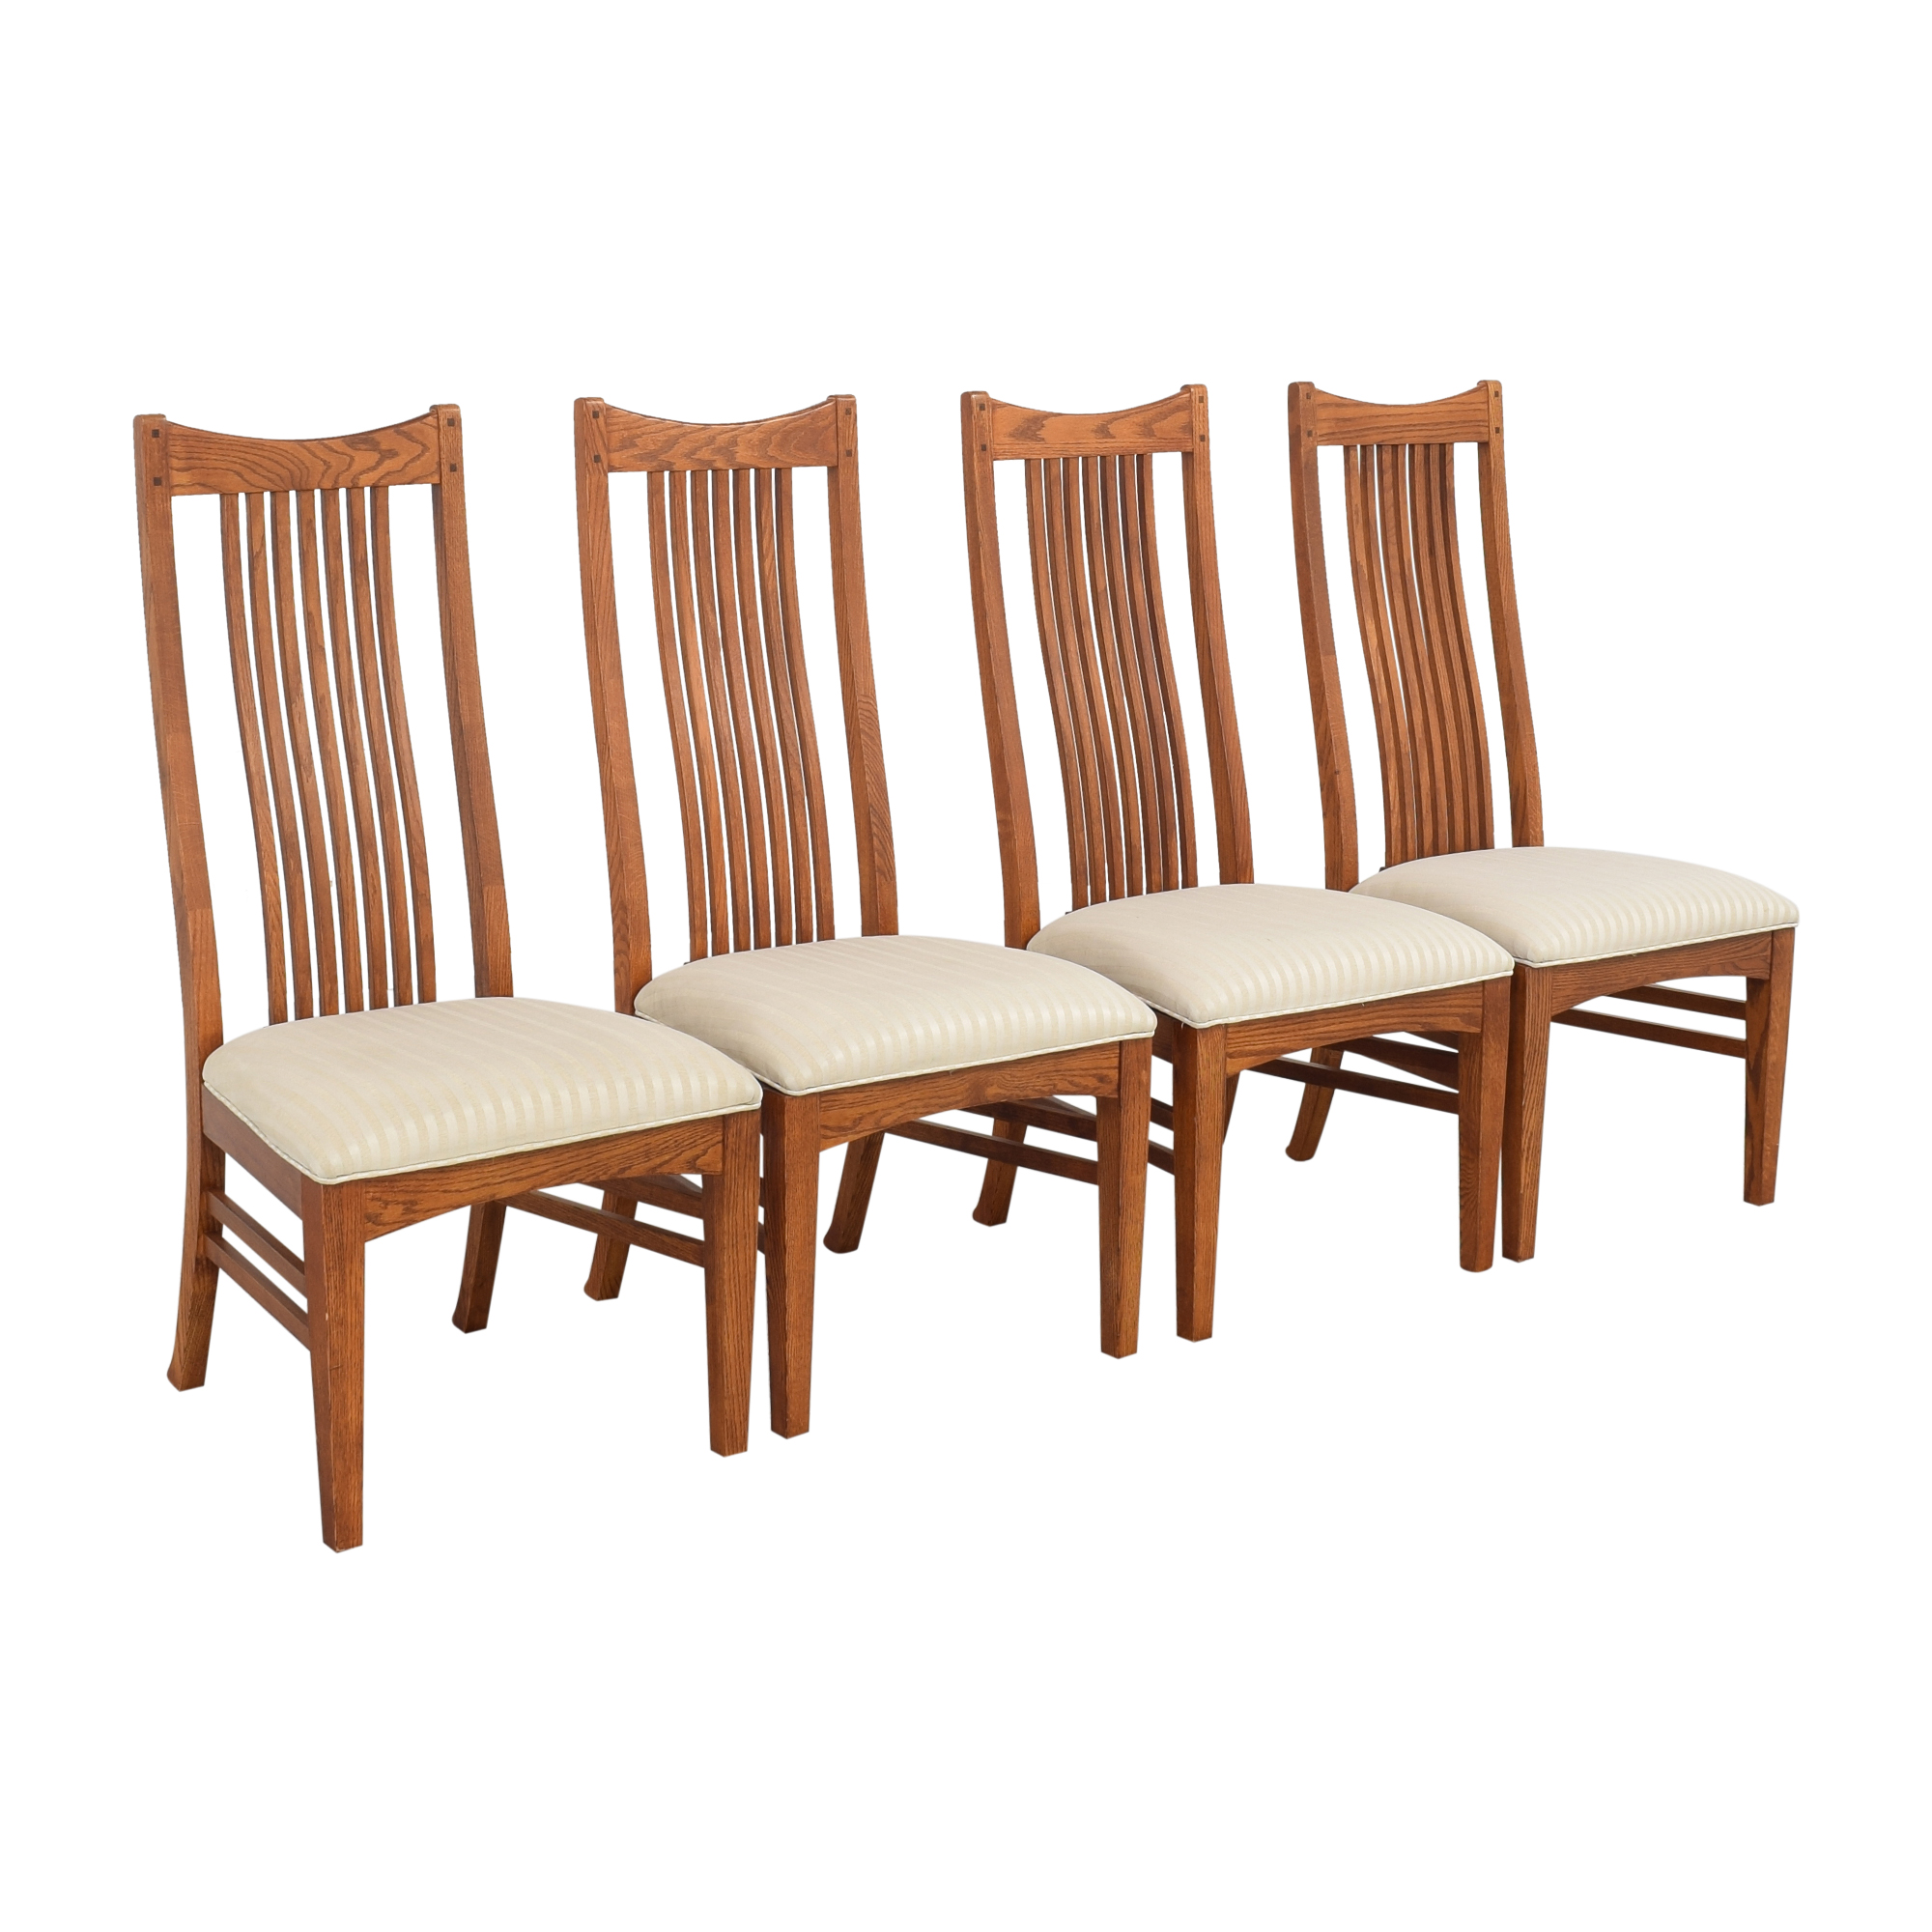 shop Lexington Furniture Upholstered Dining Chairs Lexington Furniture Dining Chairs